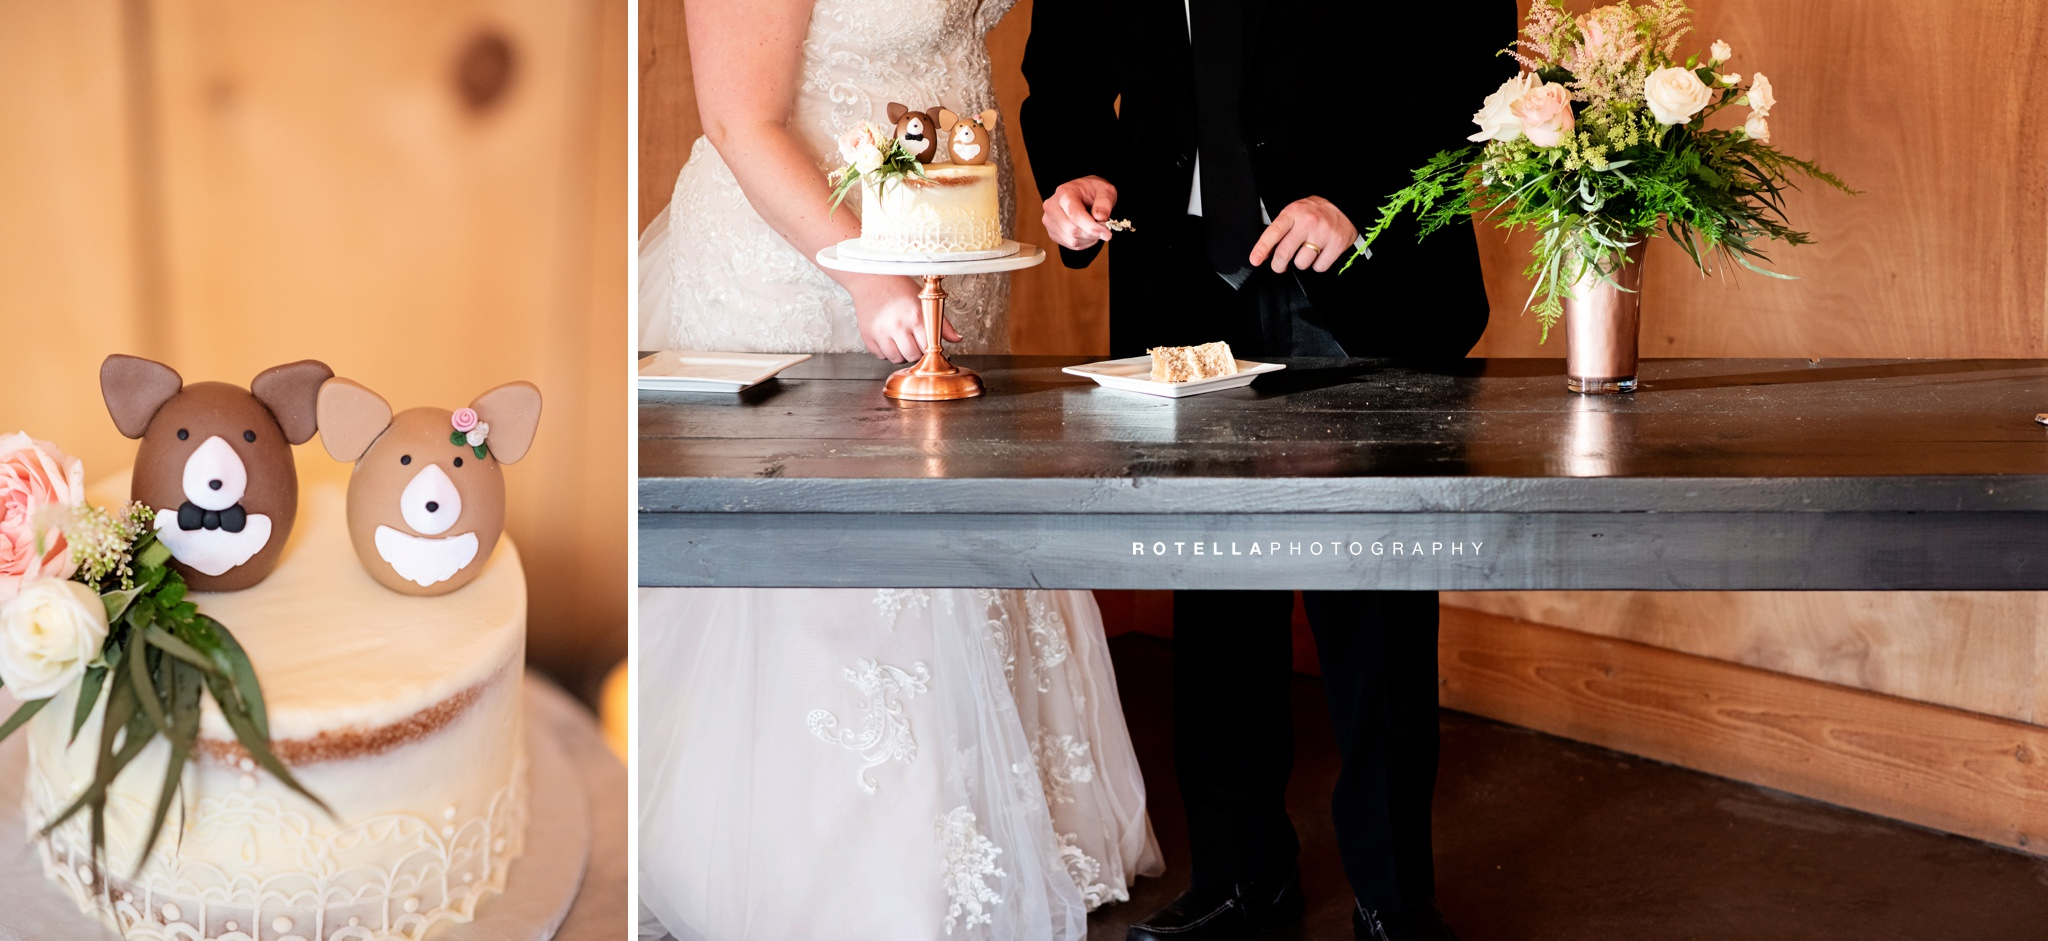 Cassie-Corbin-Wedding-05-25-2019-Rotella-Photography-PREV-97-801_BLOG.jpg